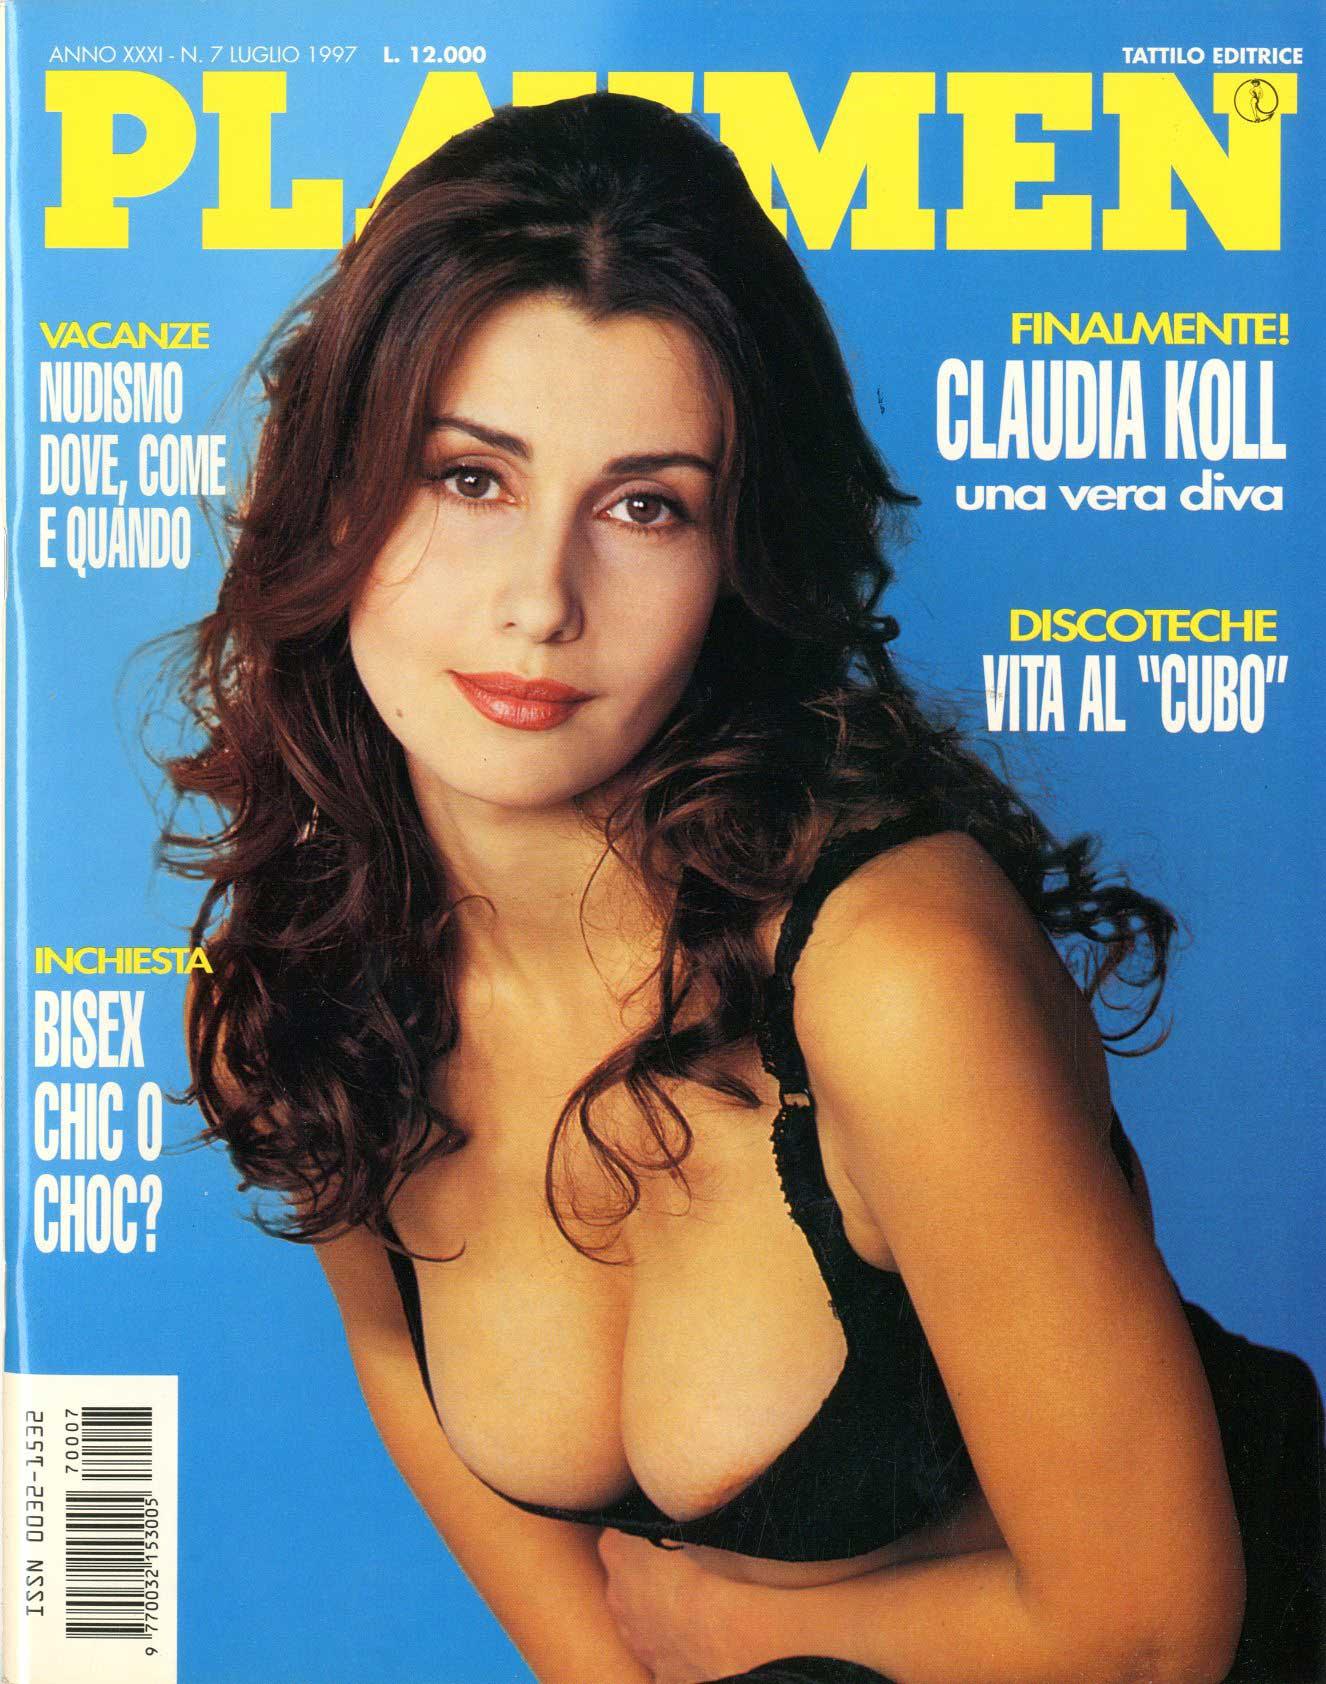 PLAYMEN-1997007.jpg